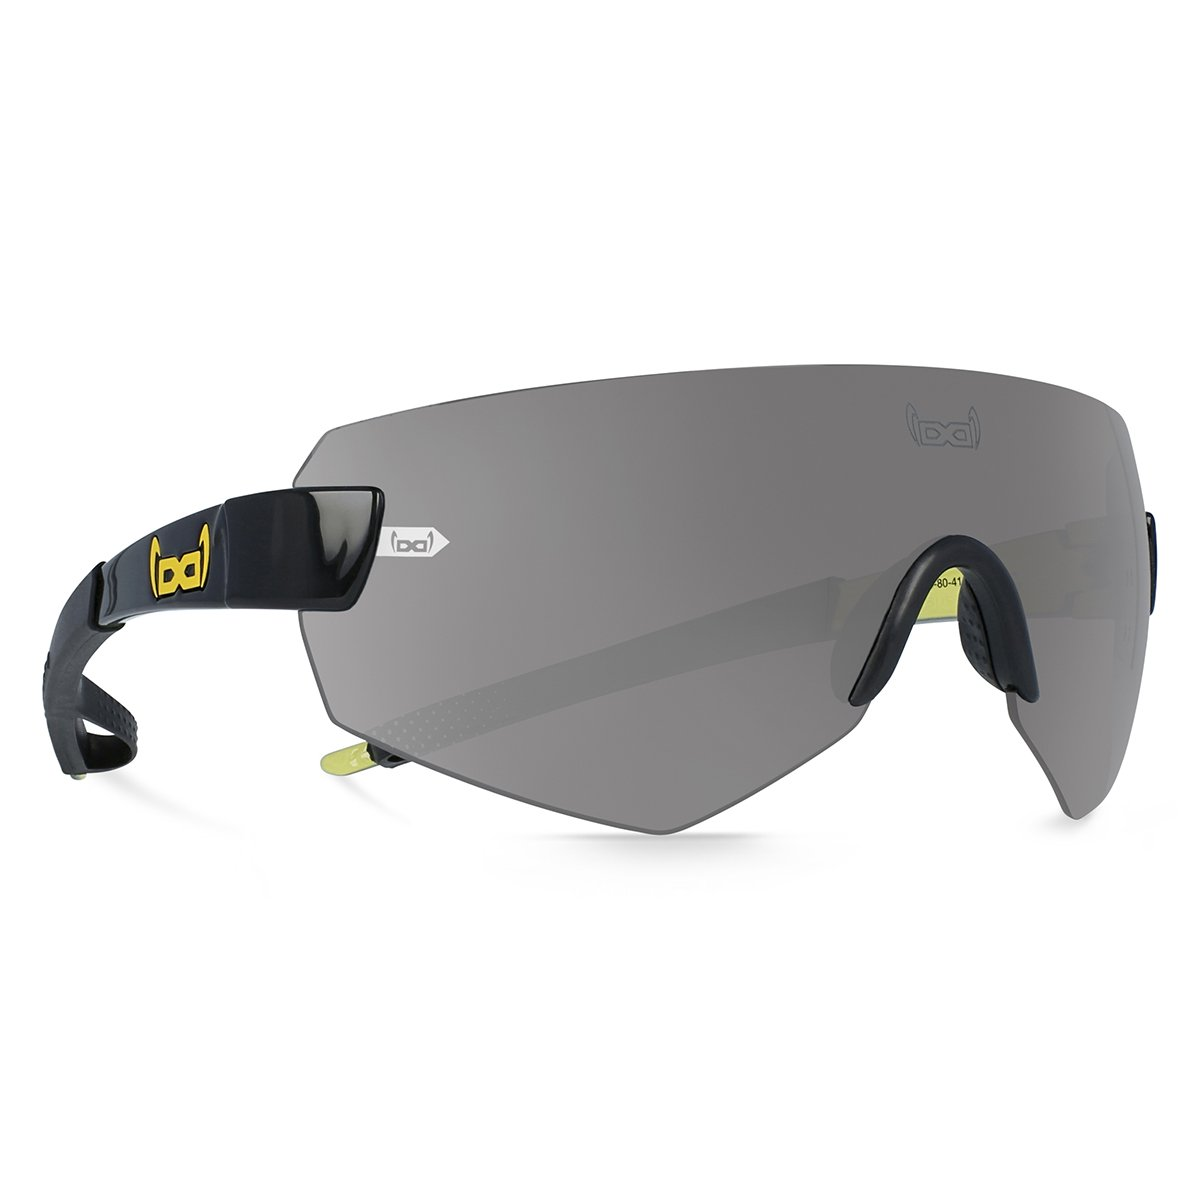 Gloryfy unbreakable eyewear Sonnenbrille G9 XTR Jan Ullrich, schwarz gelb